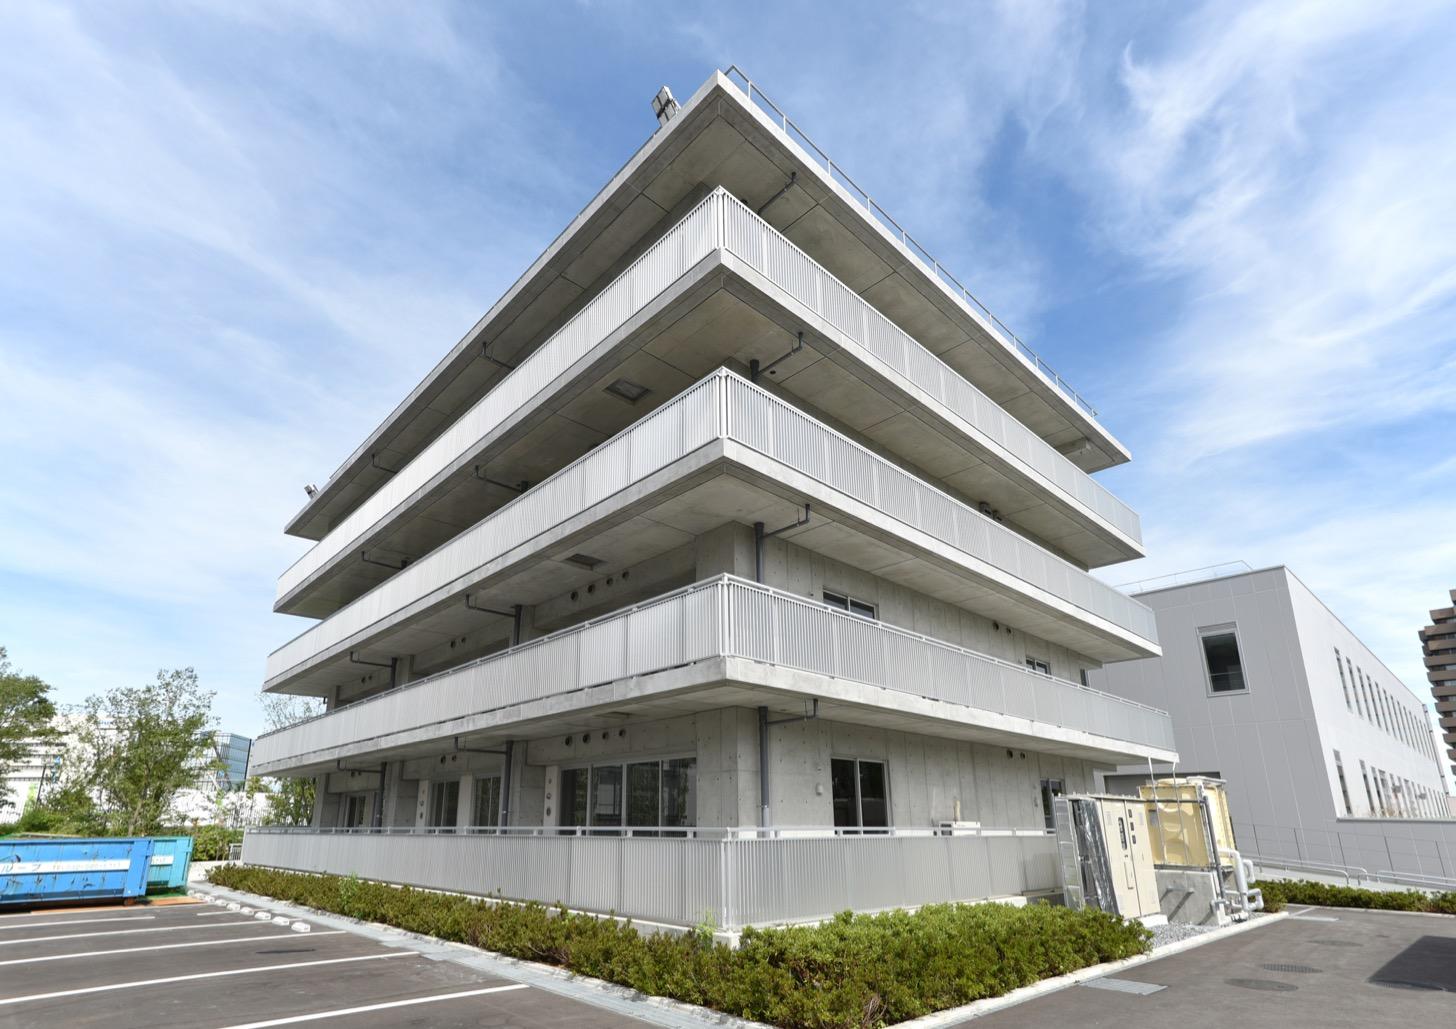 長谷工技術研究所 住宅事件棟 写真提供:長谷工コーポレーション